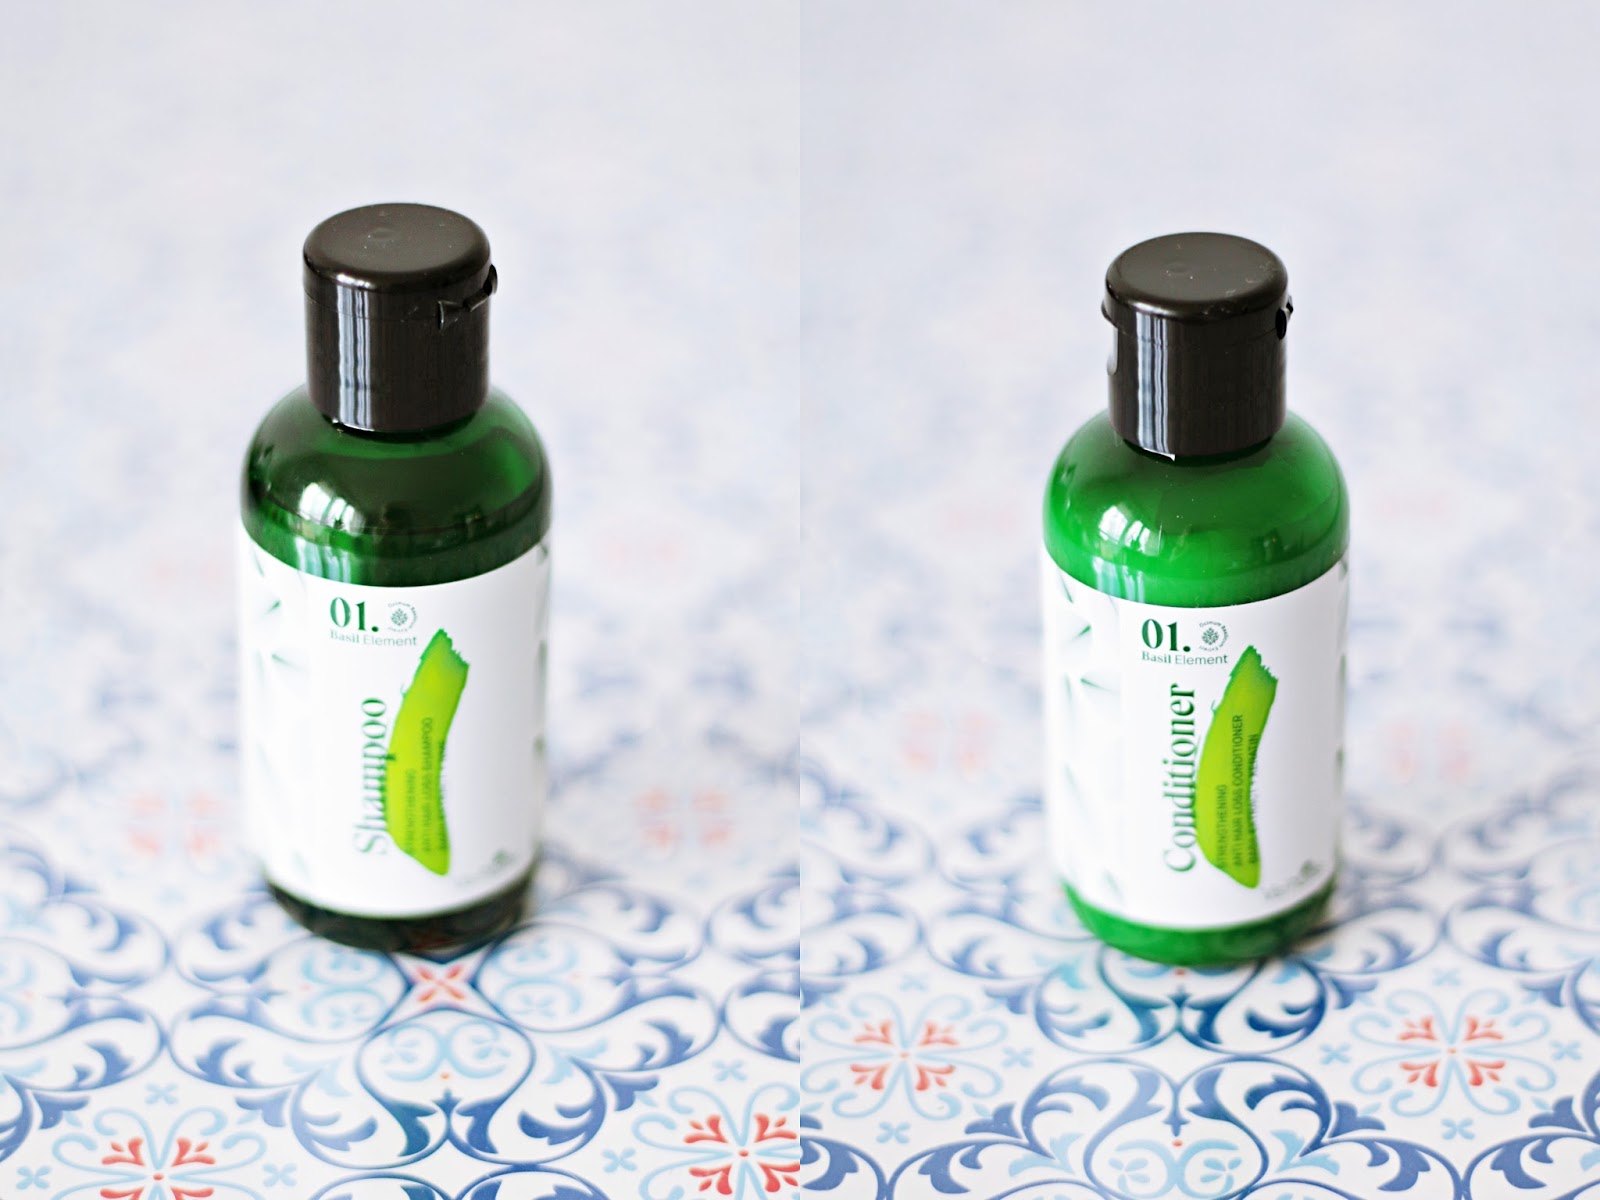 shinybox pudelka subskrypcje uroda blog